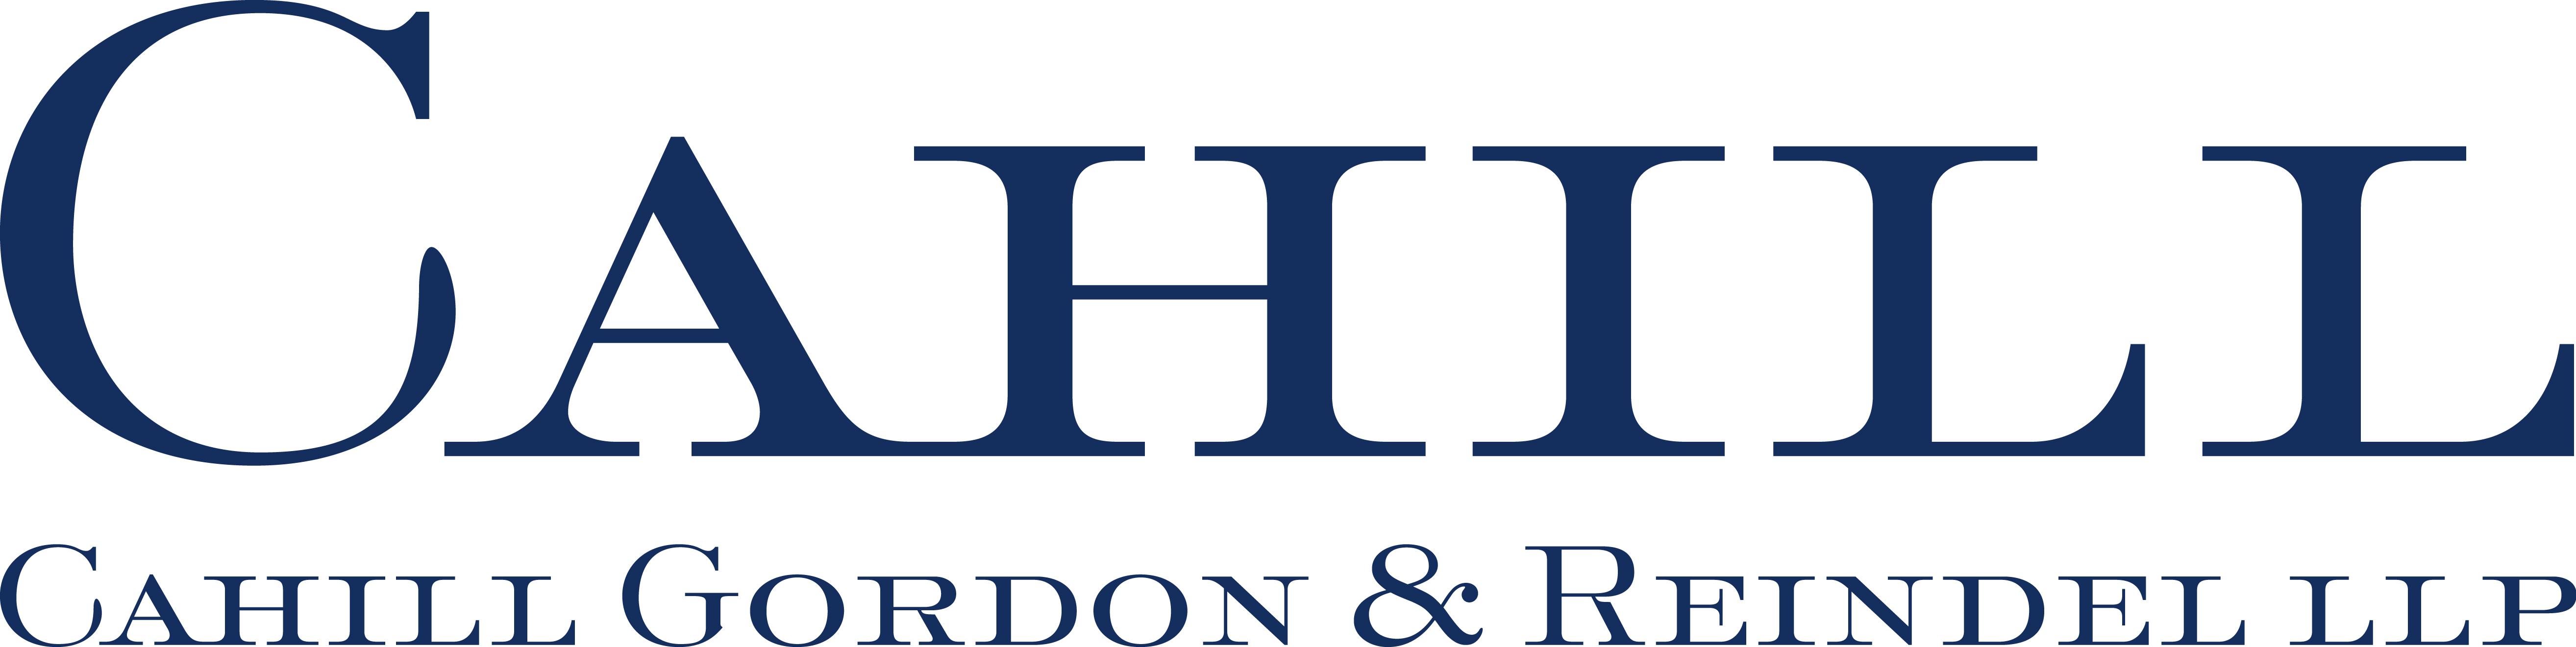 Cahill_Stacked-logo